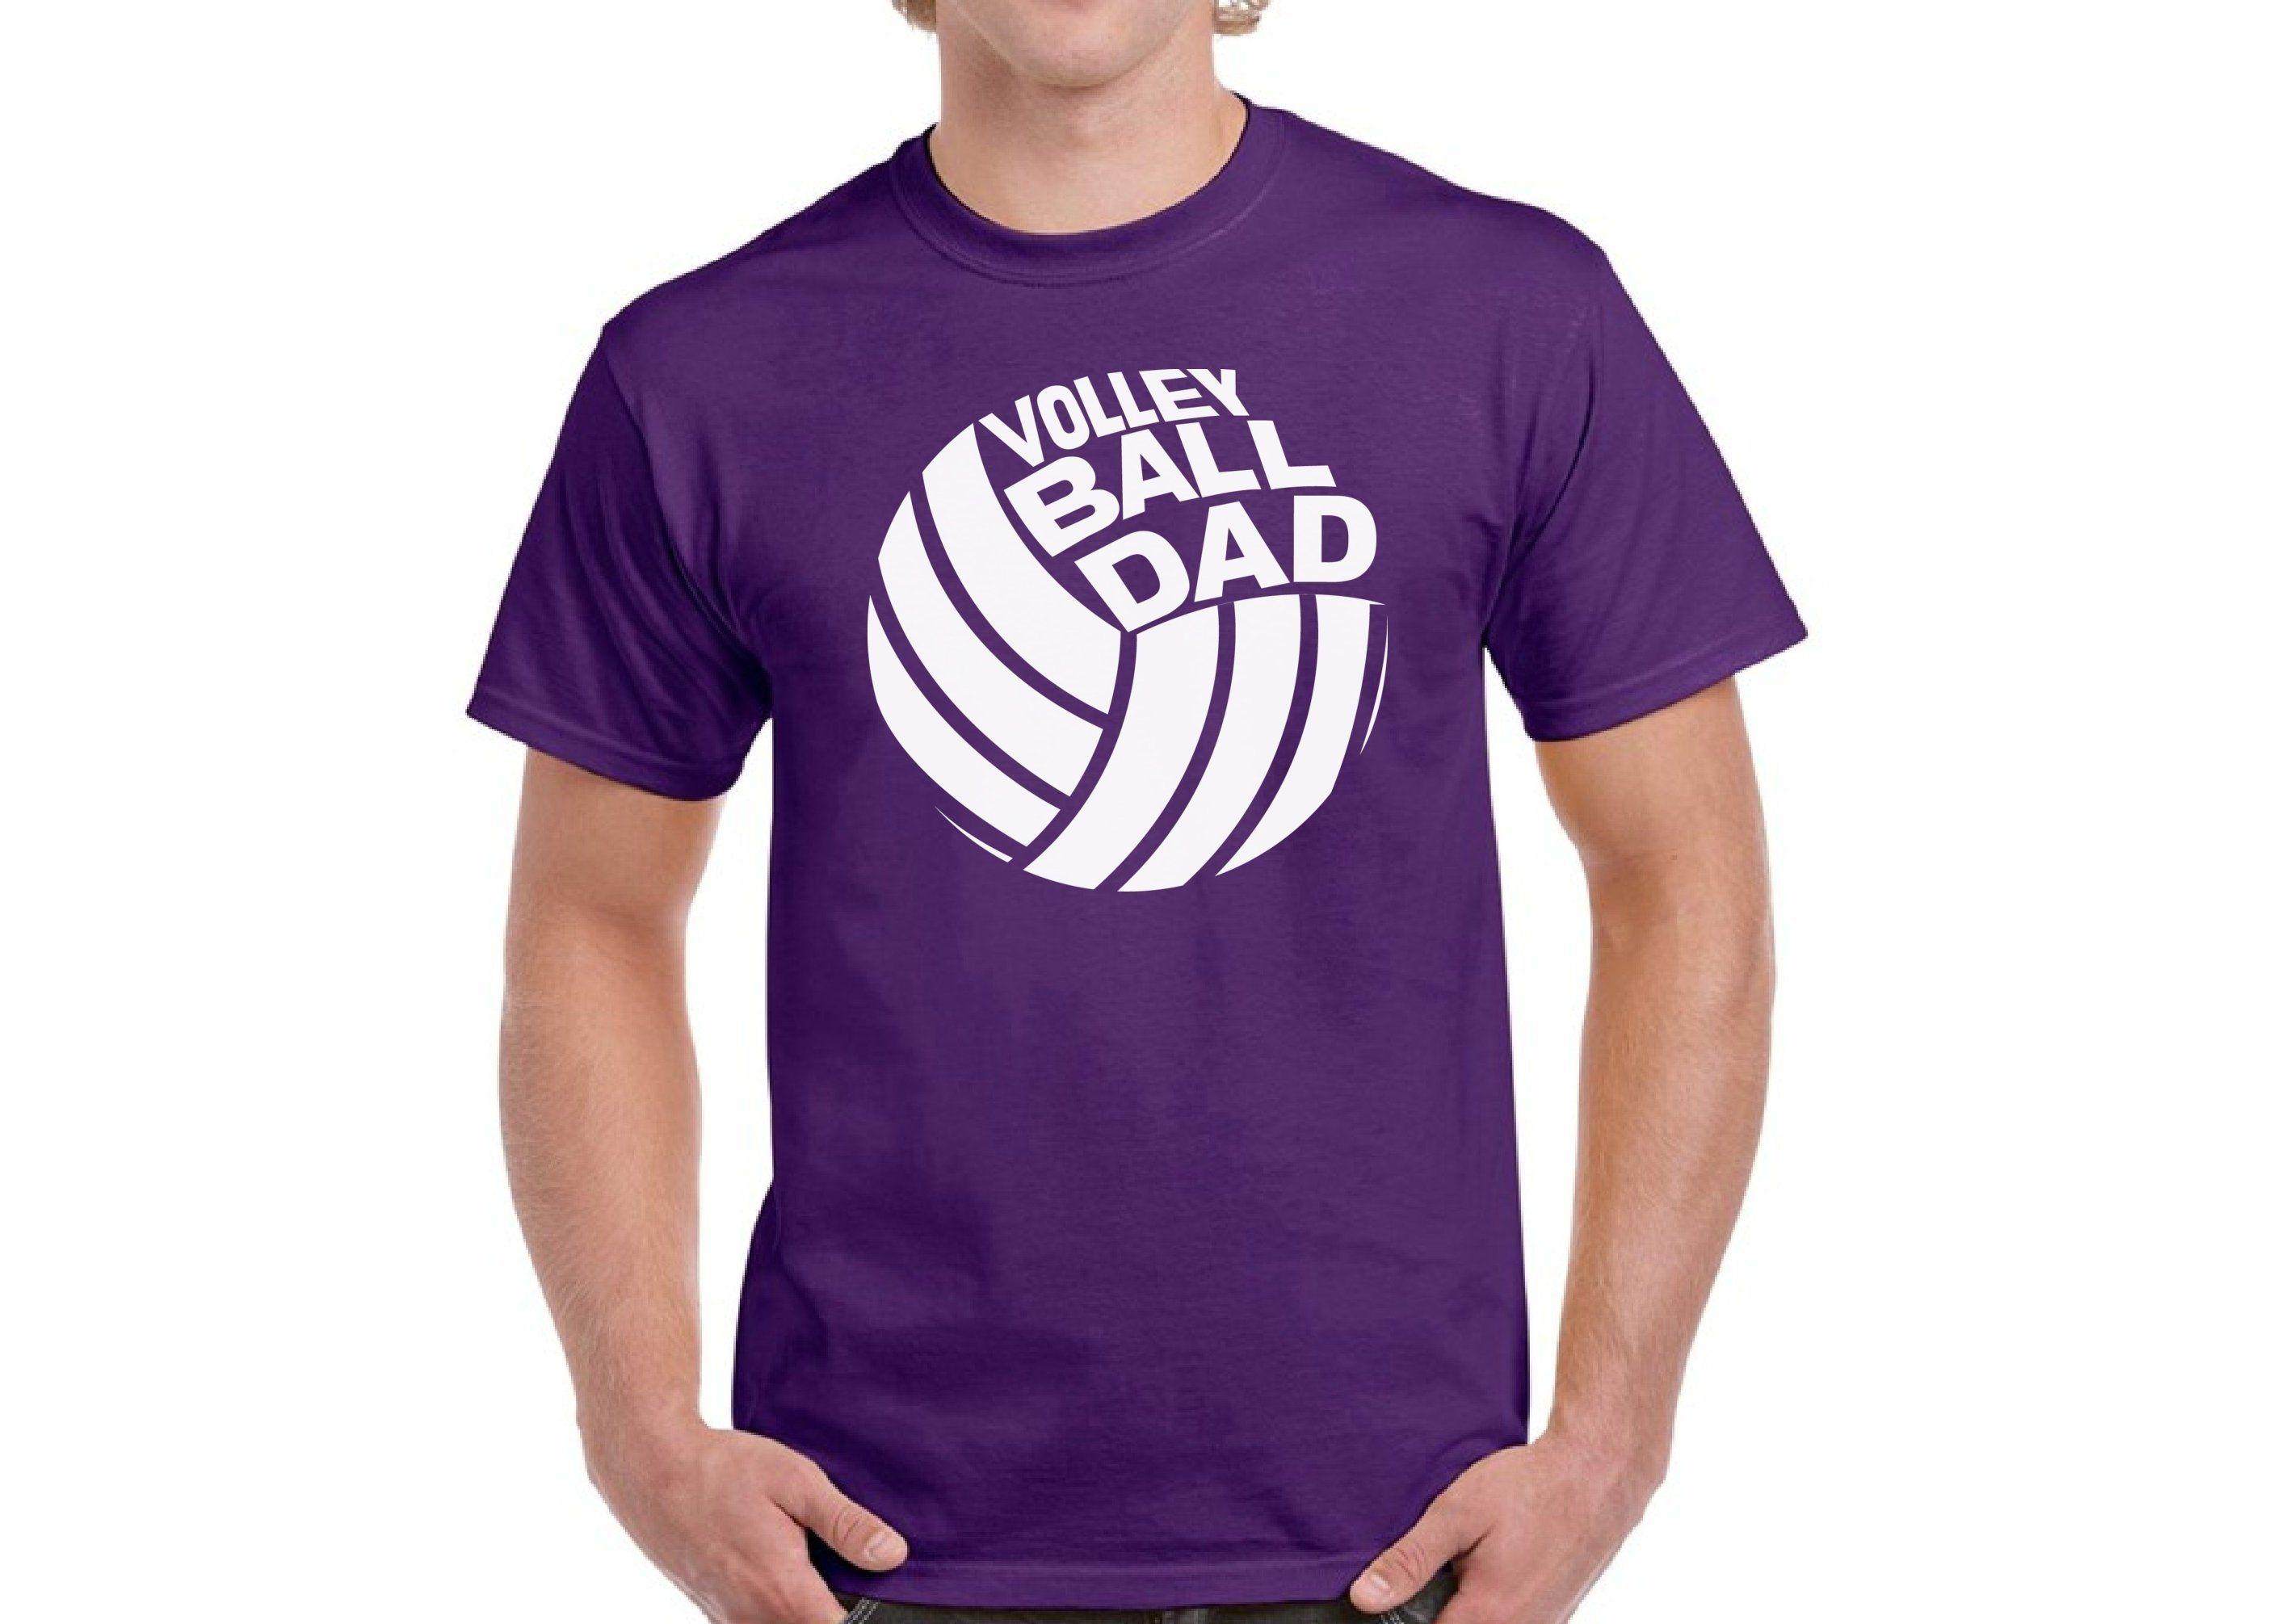 Volleyball Dad Mens Short Sleeve T Shirt 100 Cotton Sports Dad Men S Shirt Summer Workout Tshirt 2xl Blue Dad To Be Shirts Workout Tshirts Mens Shirts